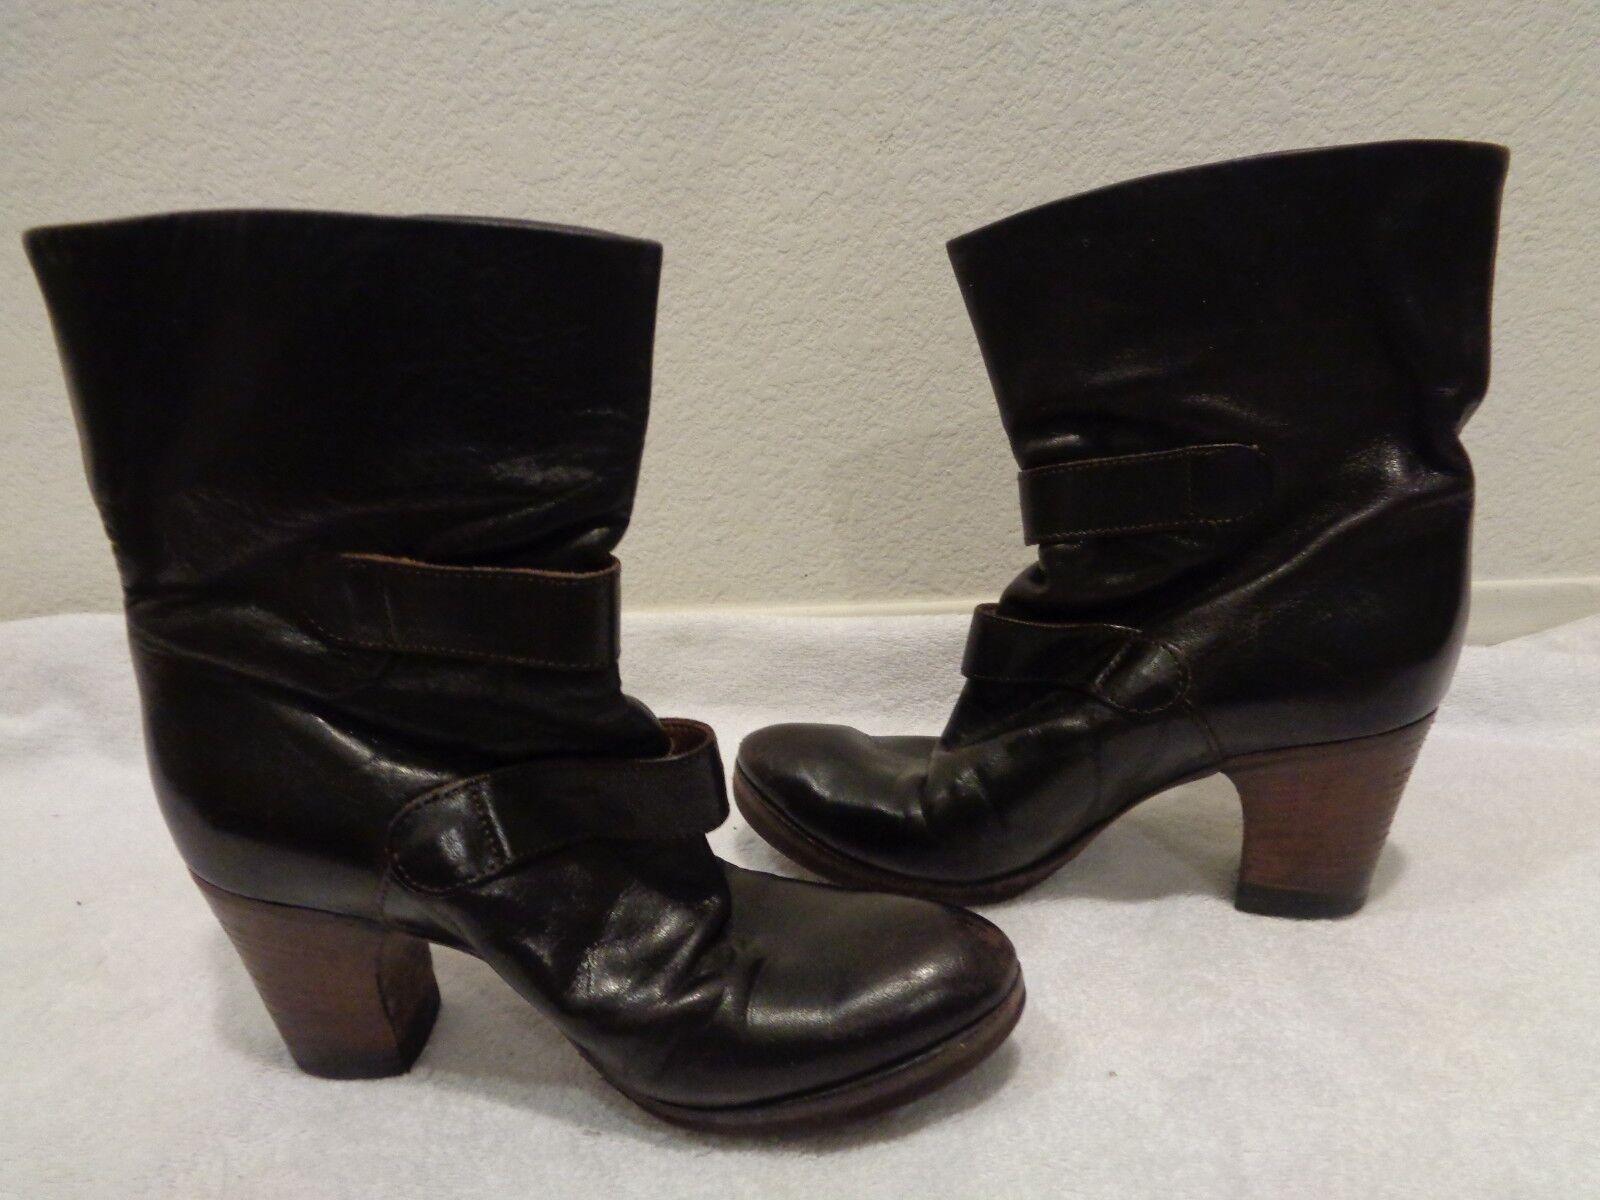 FIORENTINI + BAKER Braun Braun BAKER ankle heel buckle LEATHER Stiefel 37.5/7.5 abe25d